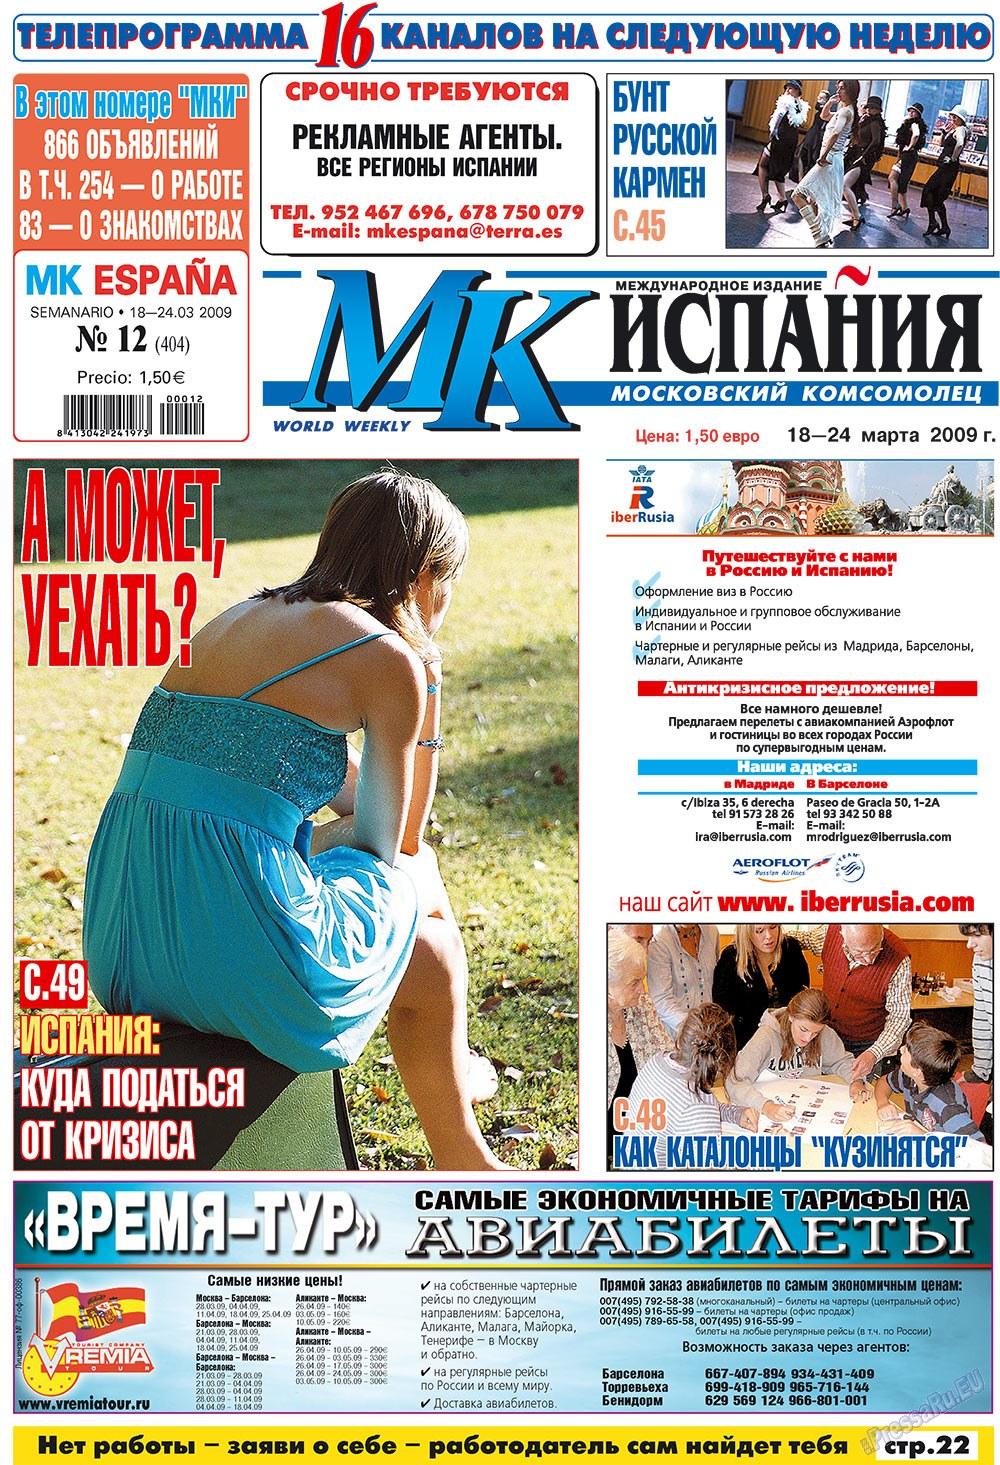 МК Испания (газета). 2009 год, номер 12, стр. 1